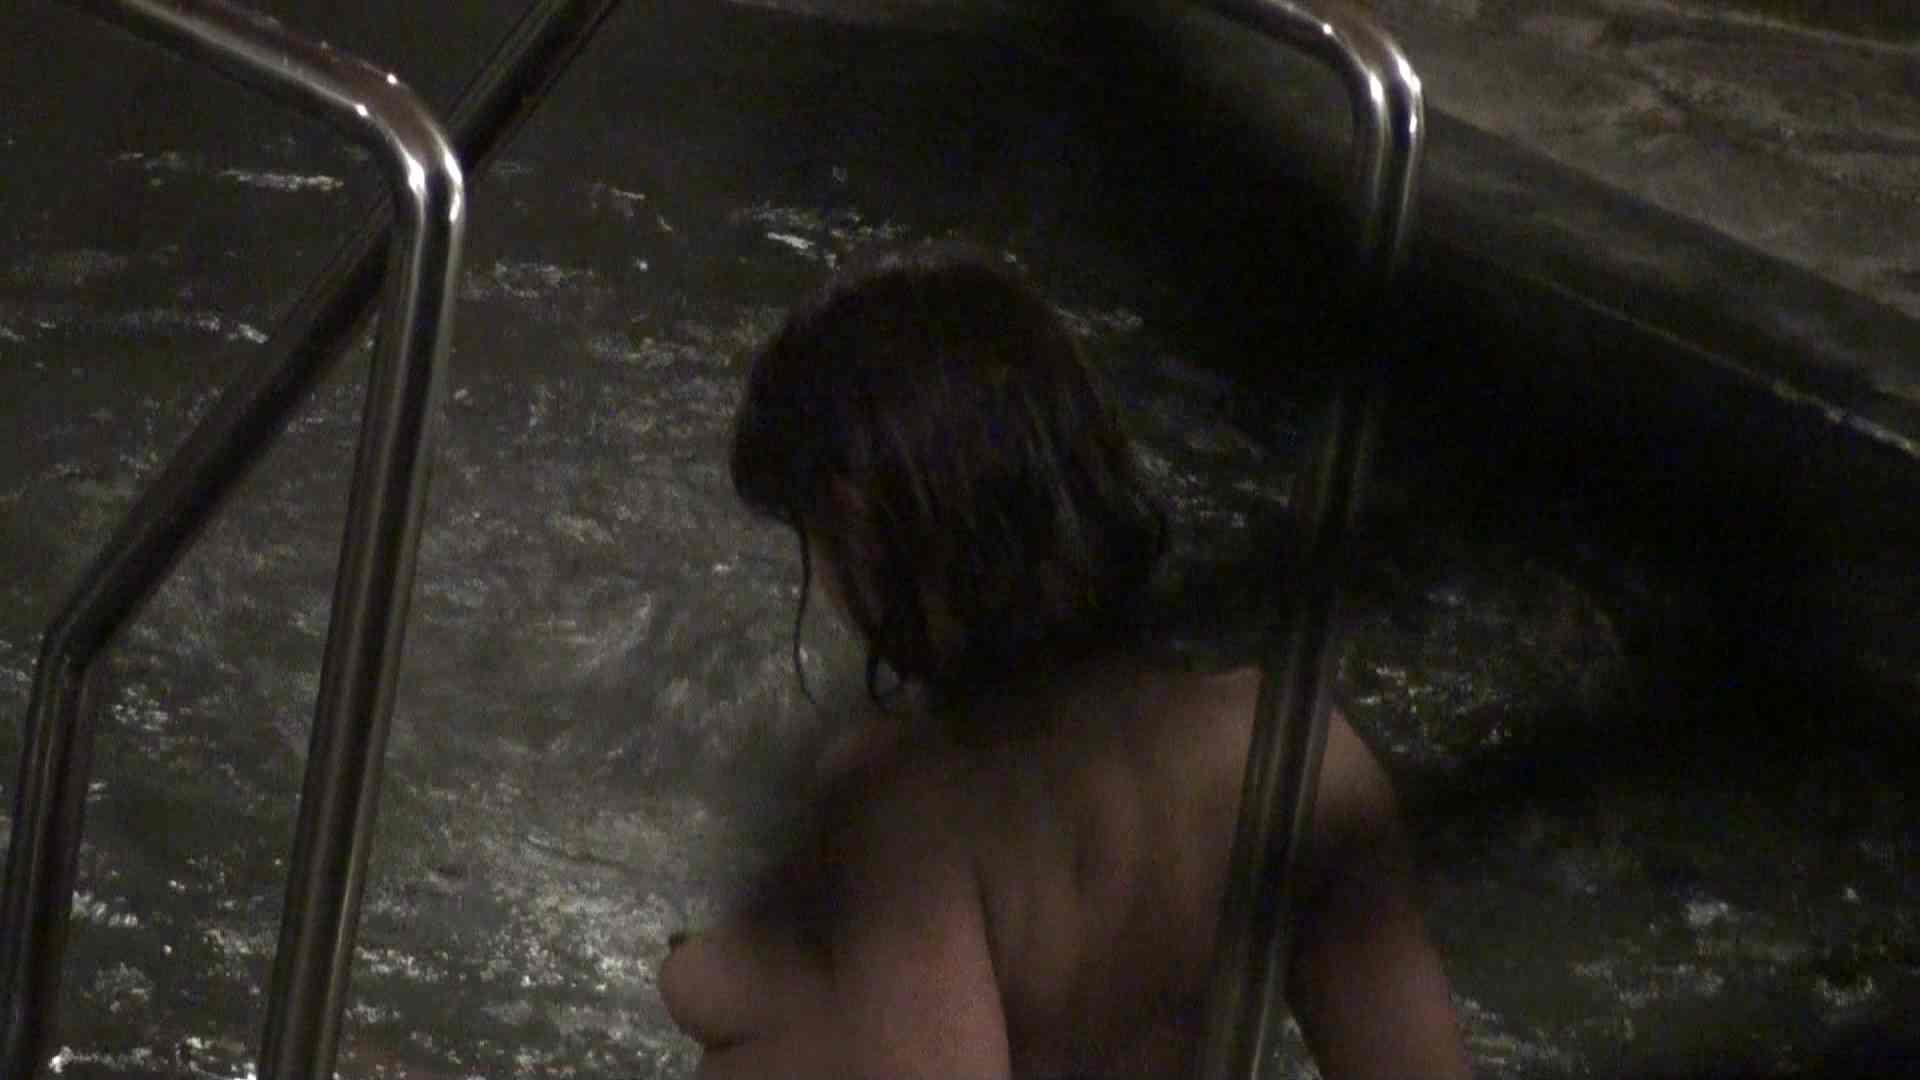 Aquaな露天風呂Vol.392 盗撮 オマンコ無修正動画無料 96画像 41